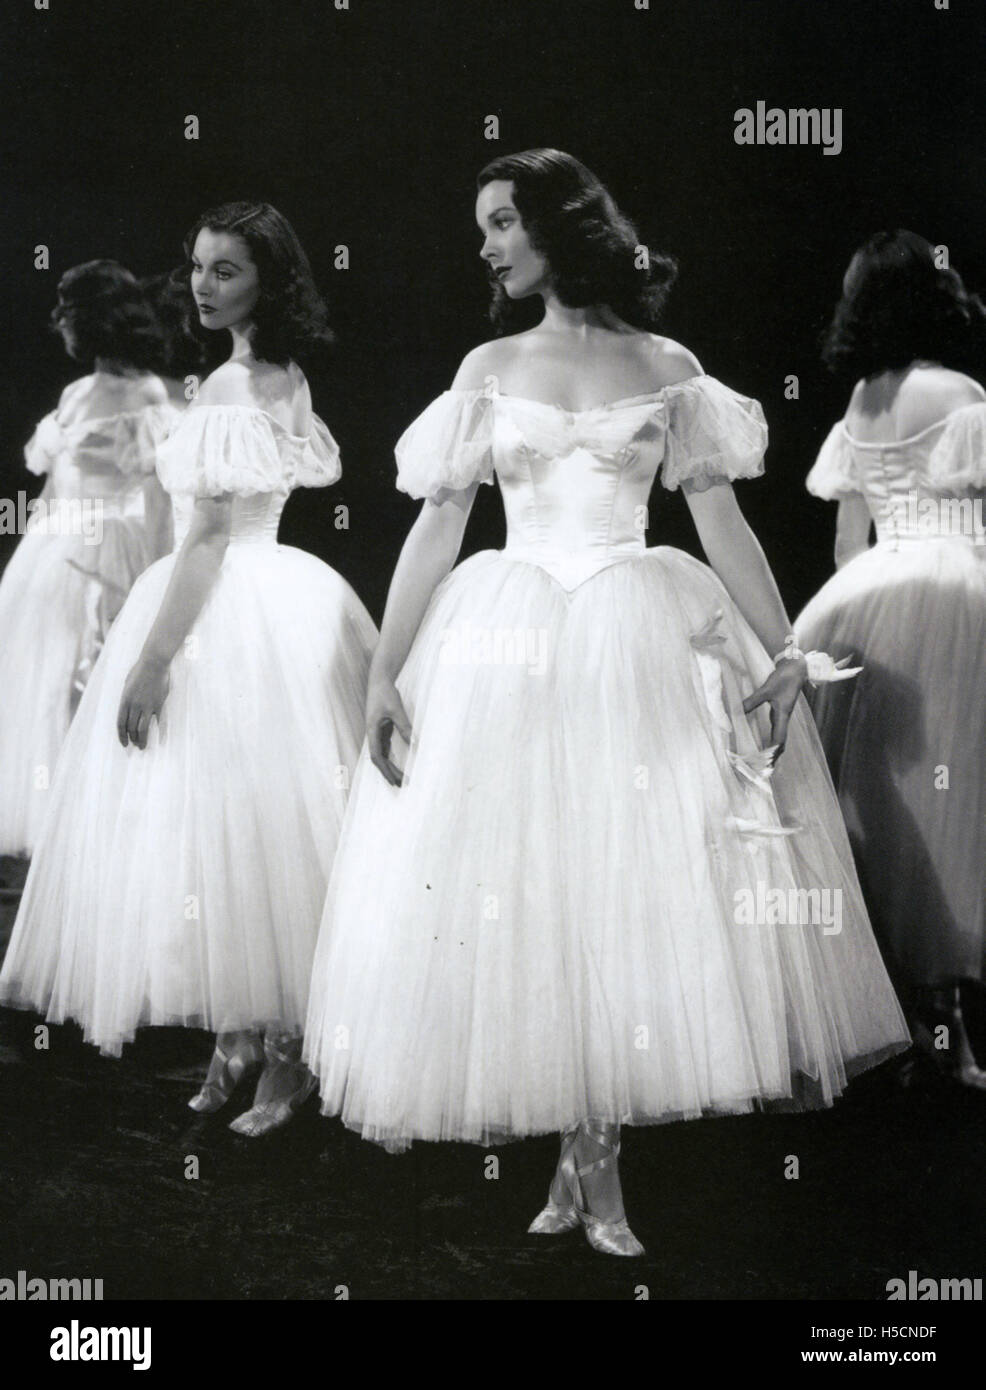 WATERLOO BRIDGE de 1940 películas de MGM con Vivien Leigh Imagen De Stock